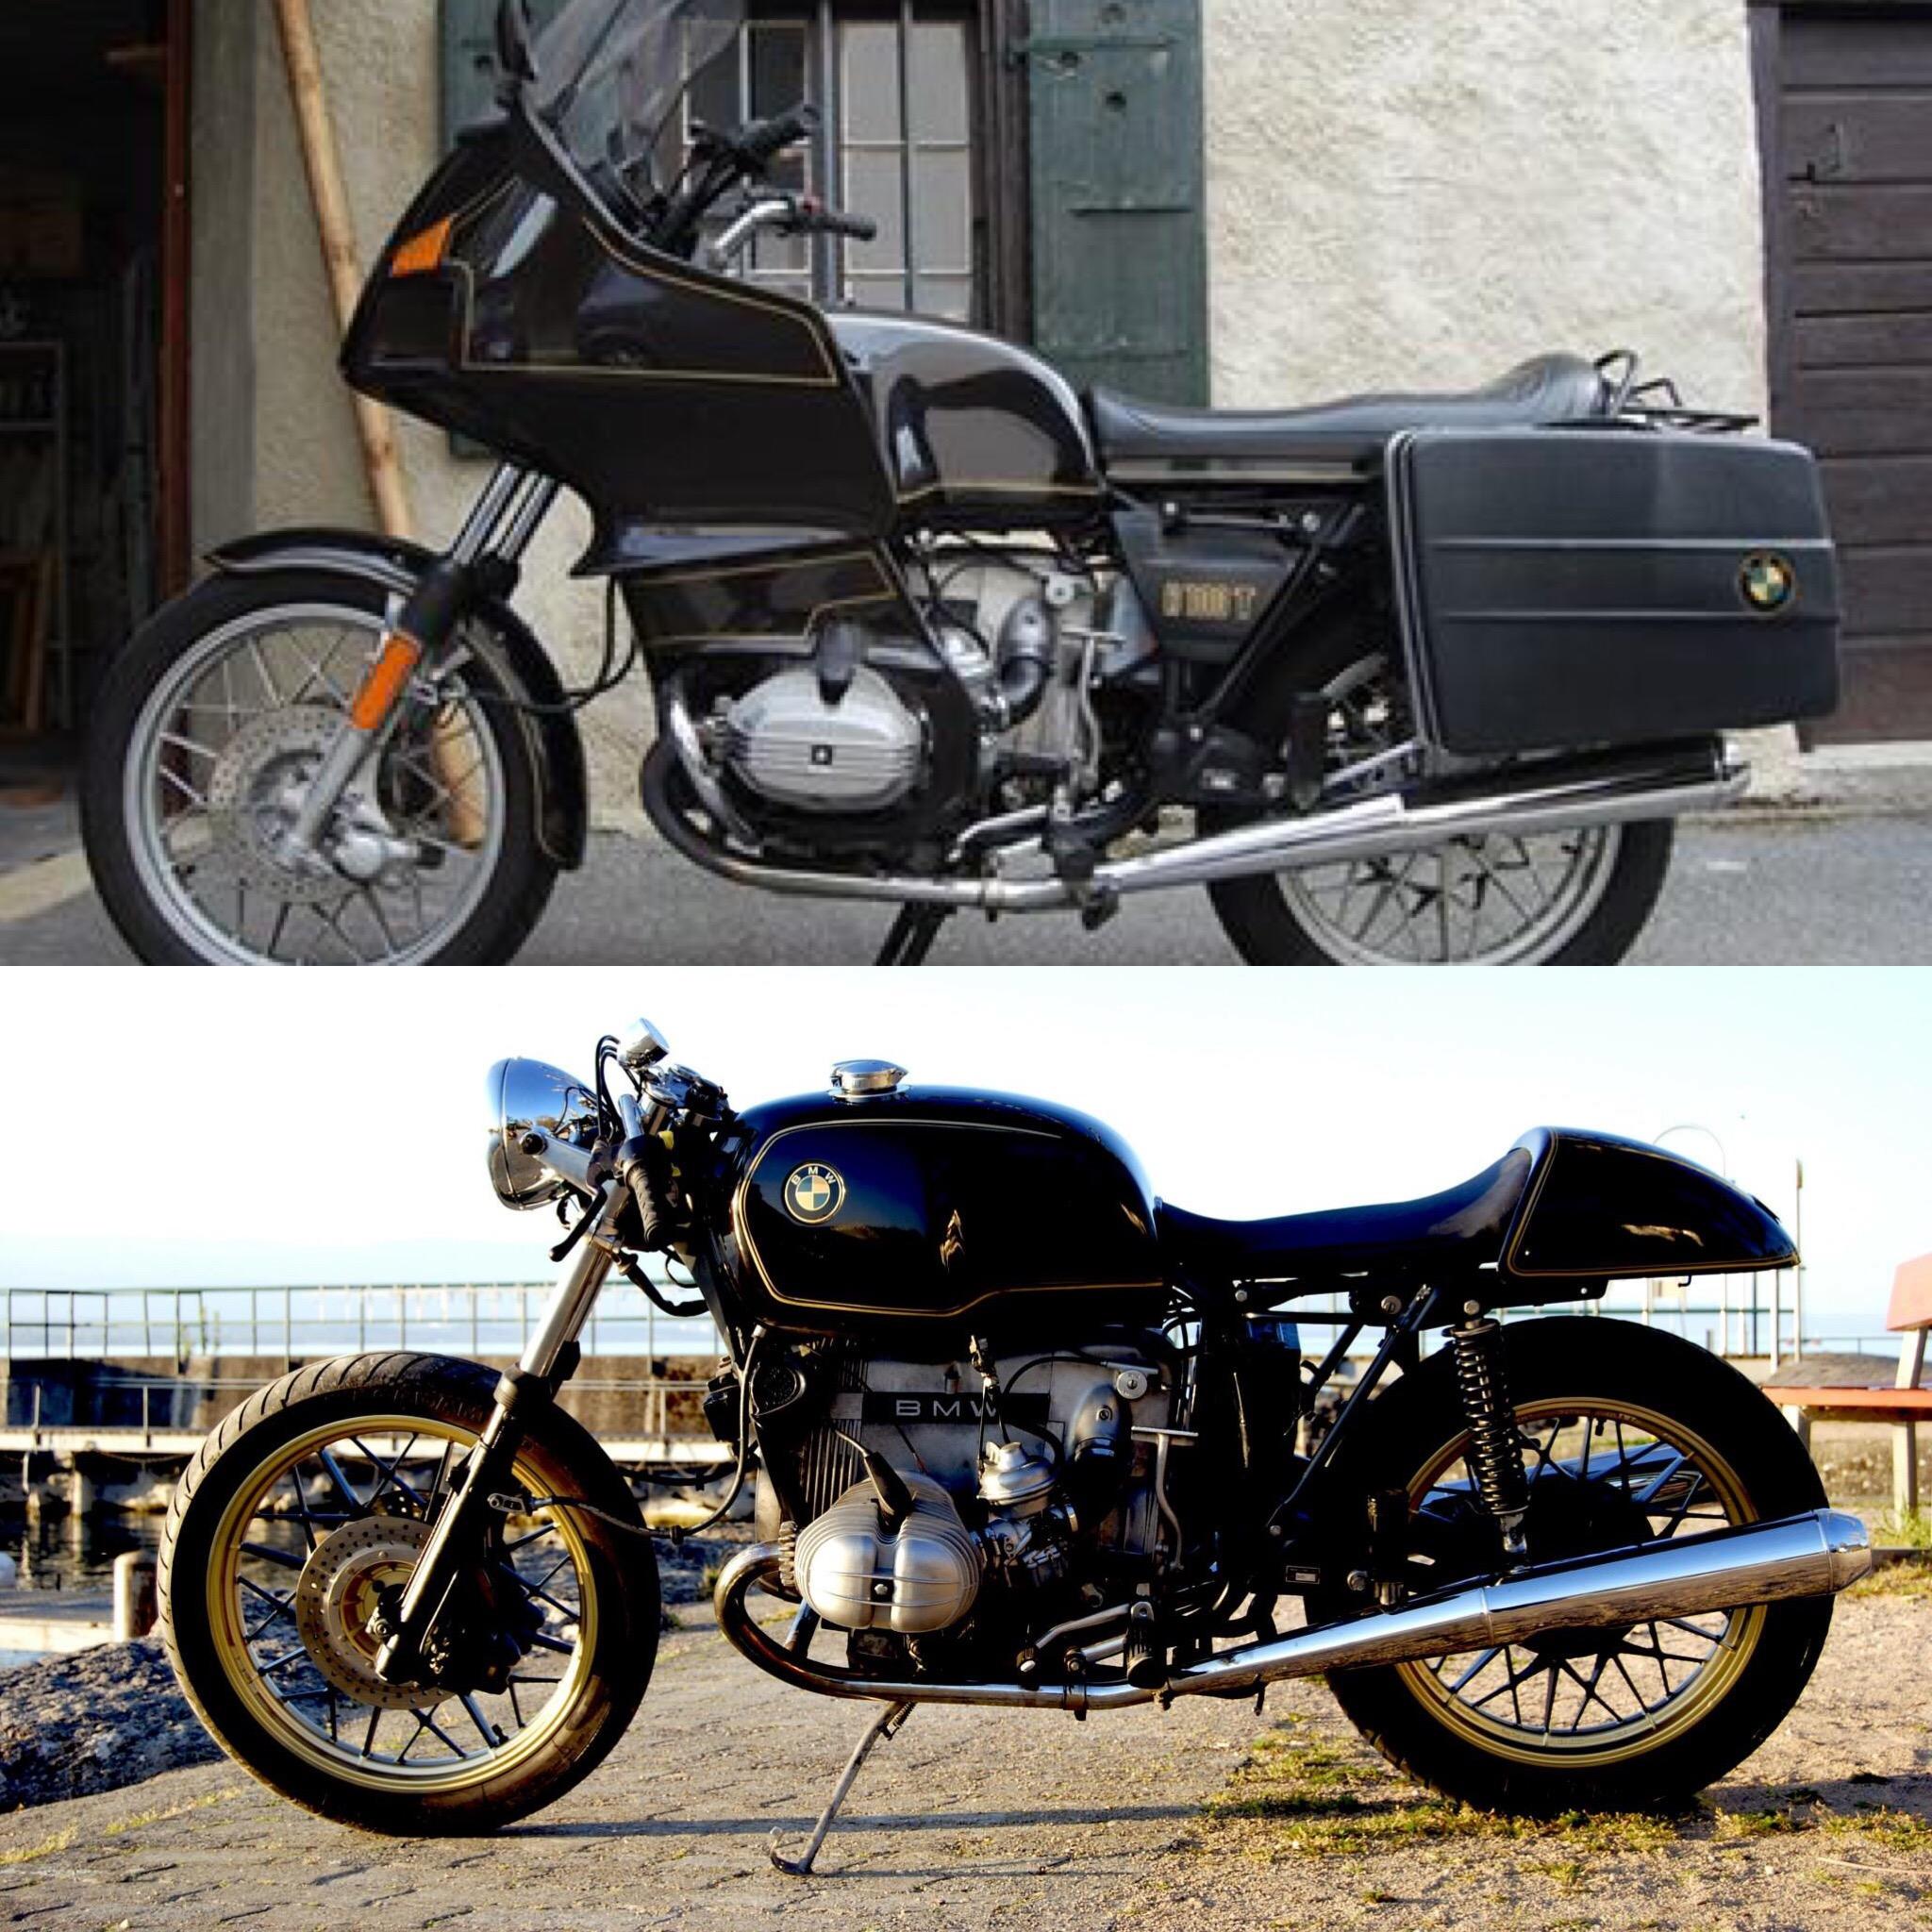 Copy of BMW R100 RT